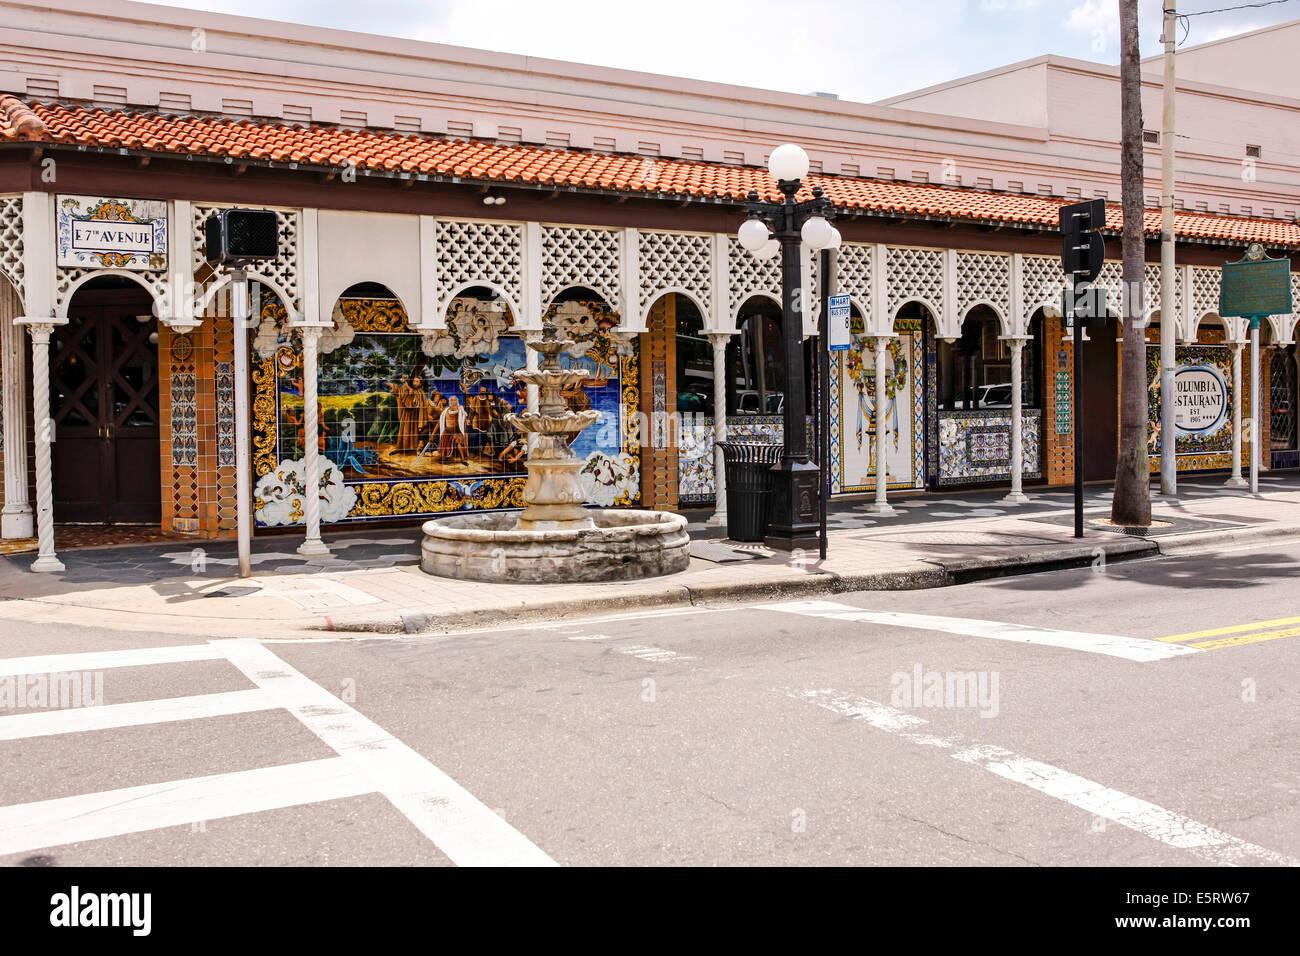 Spanish Influenced Architecture In Ybor City Tampa Florida